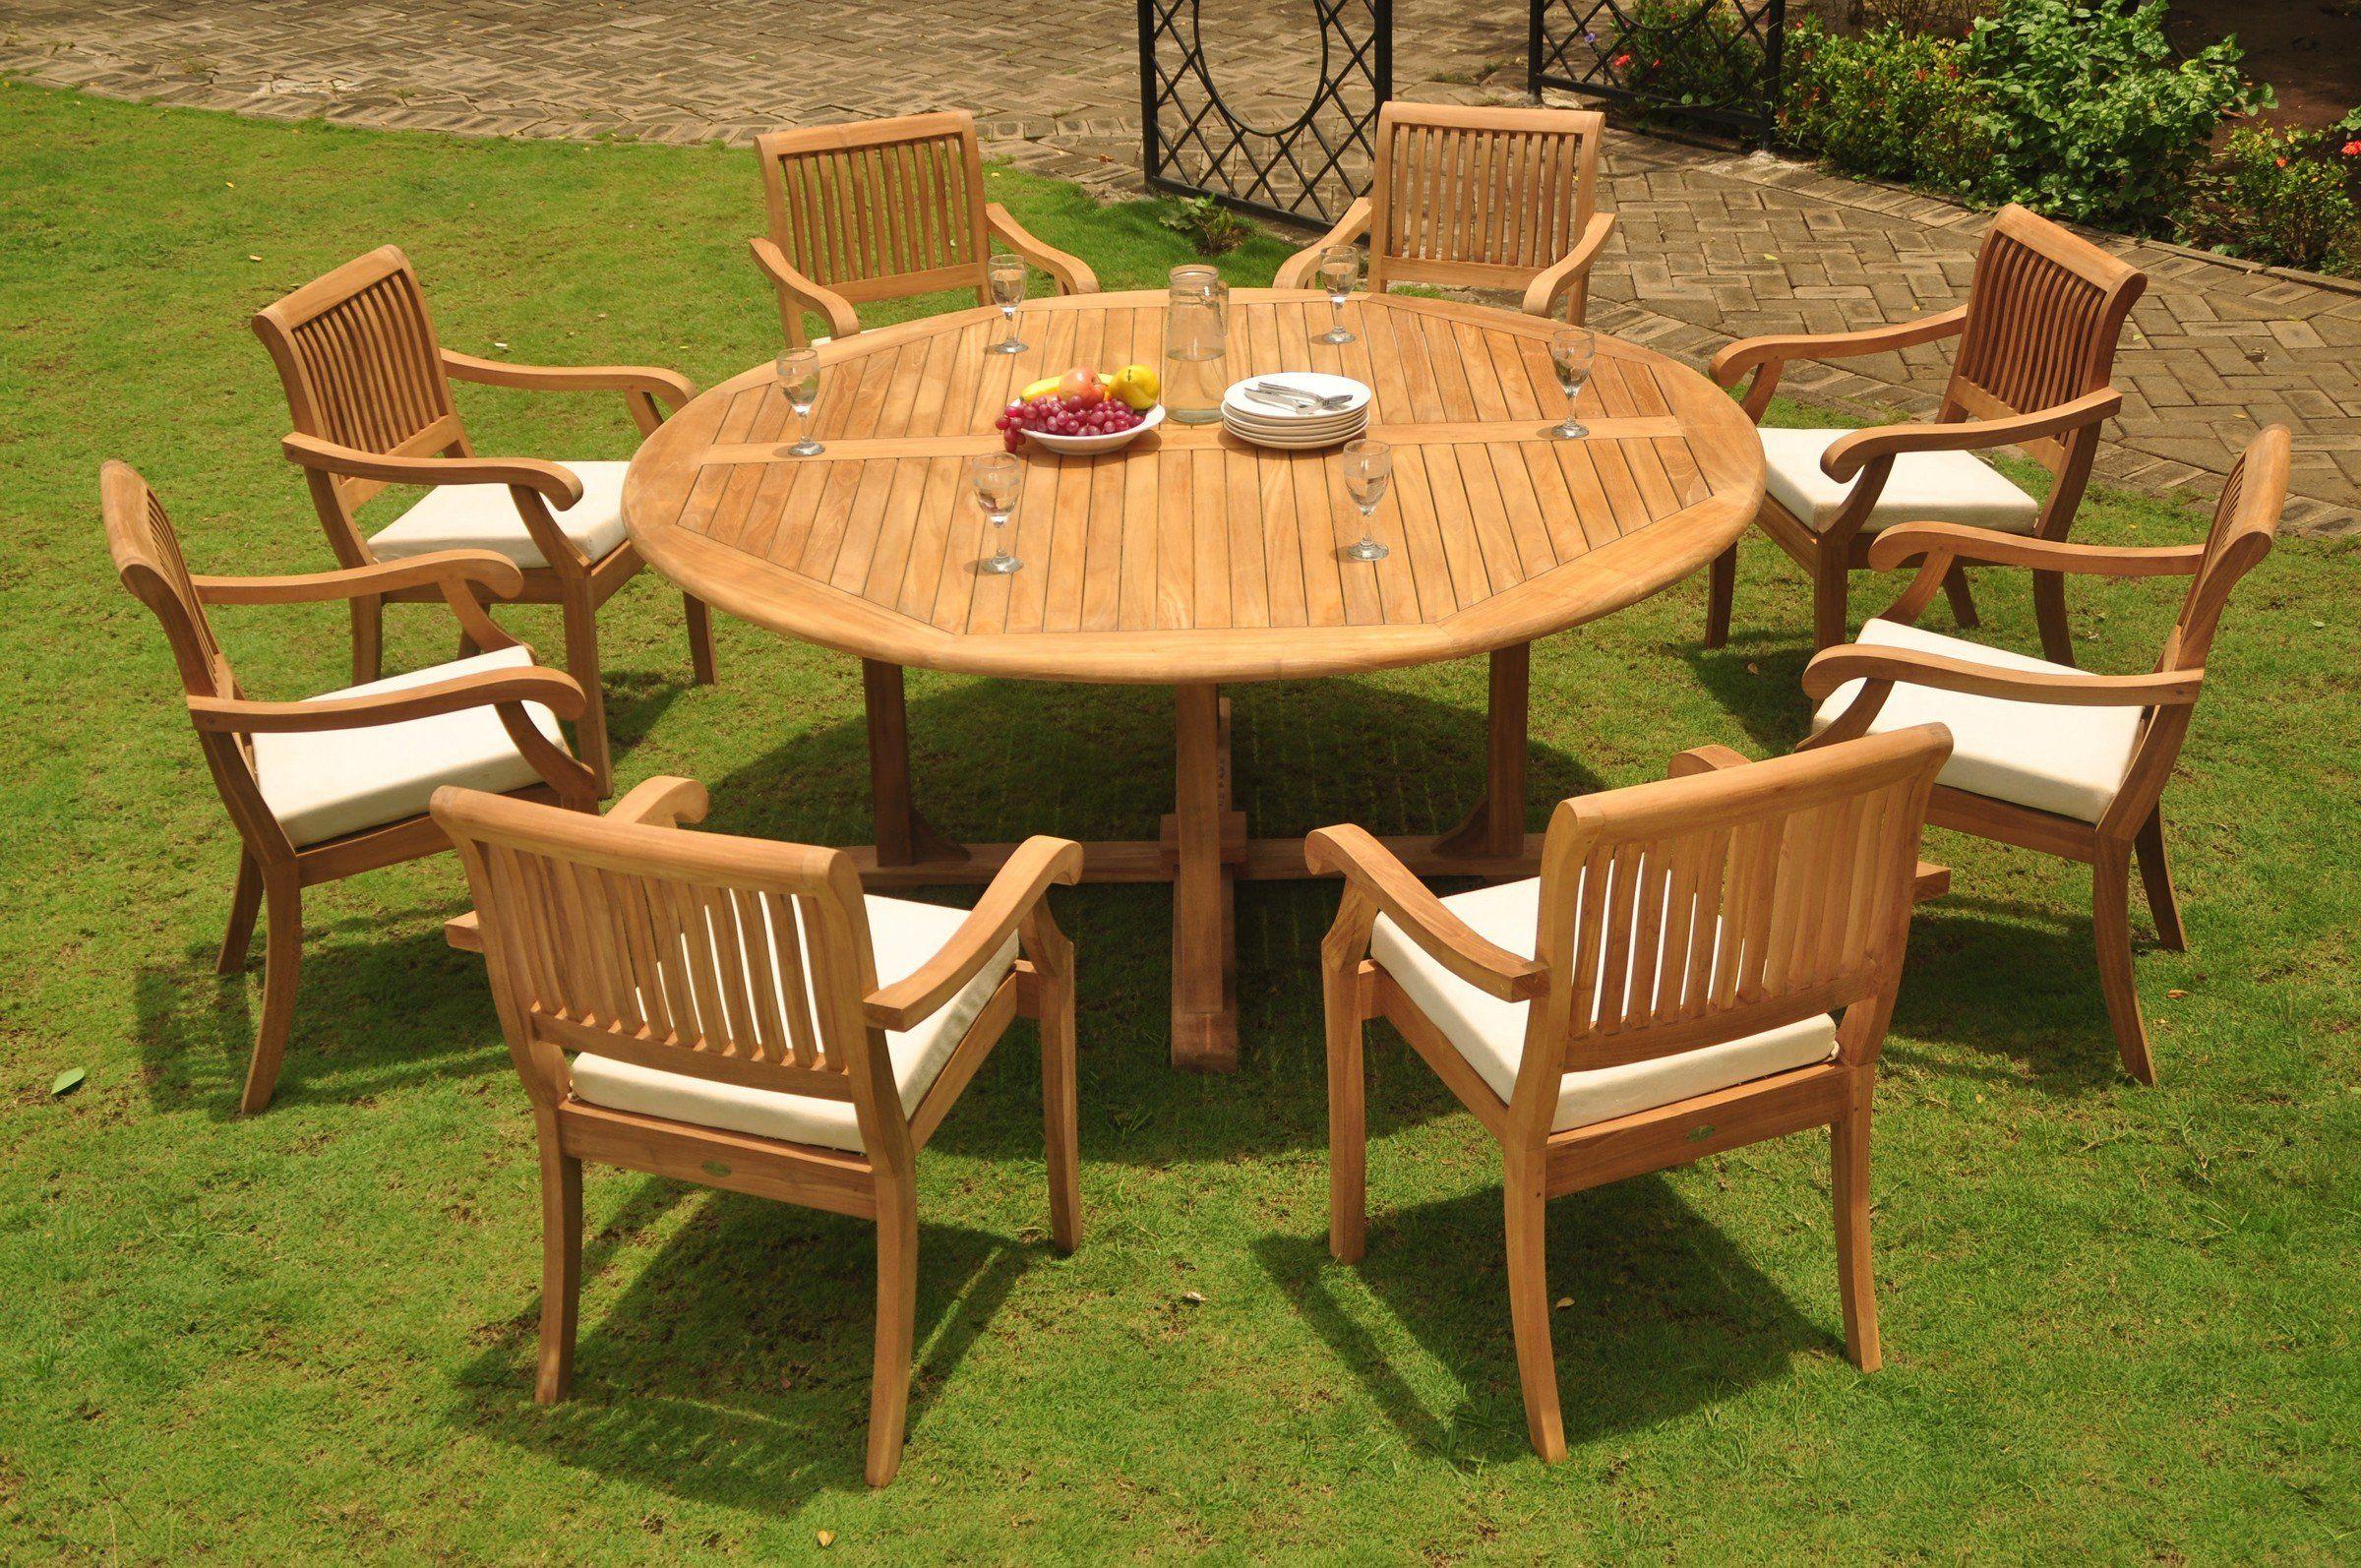 GradeA Teak Wood Dining Set 8 Seater 9 Pc: 72 Round Dining ...